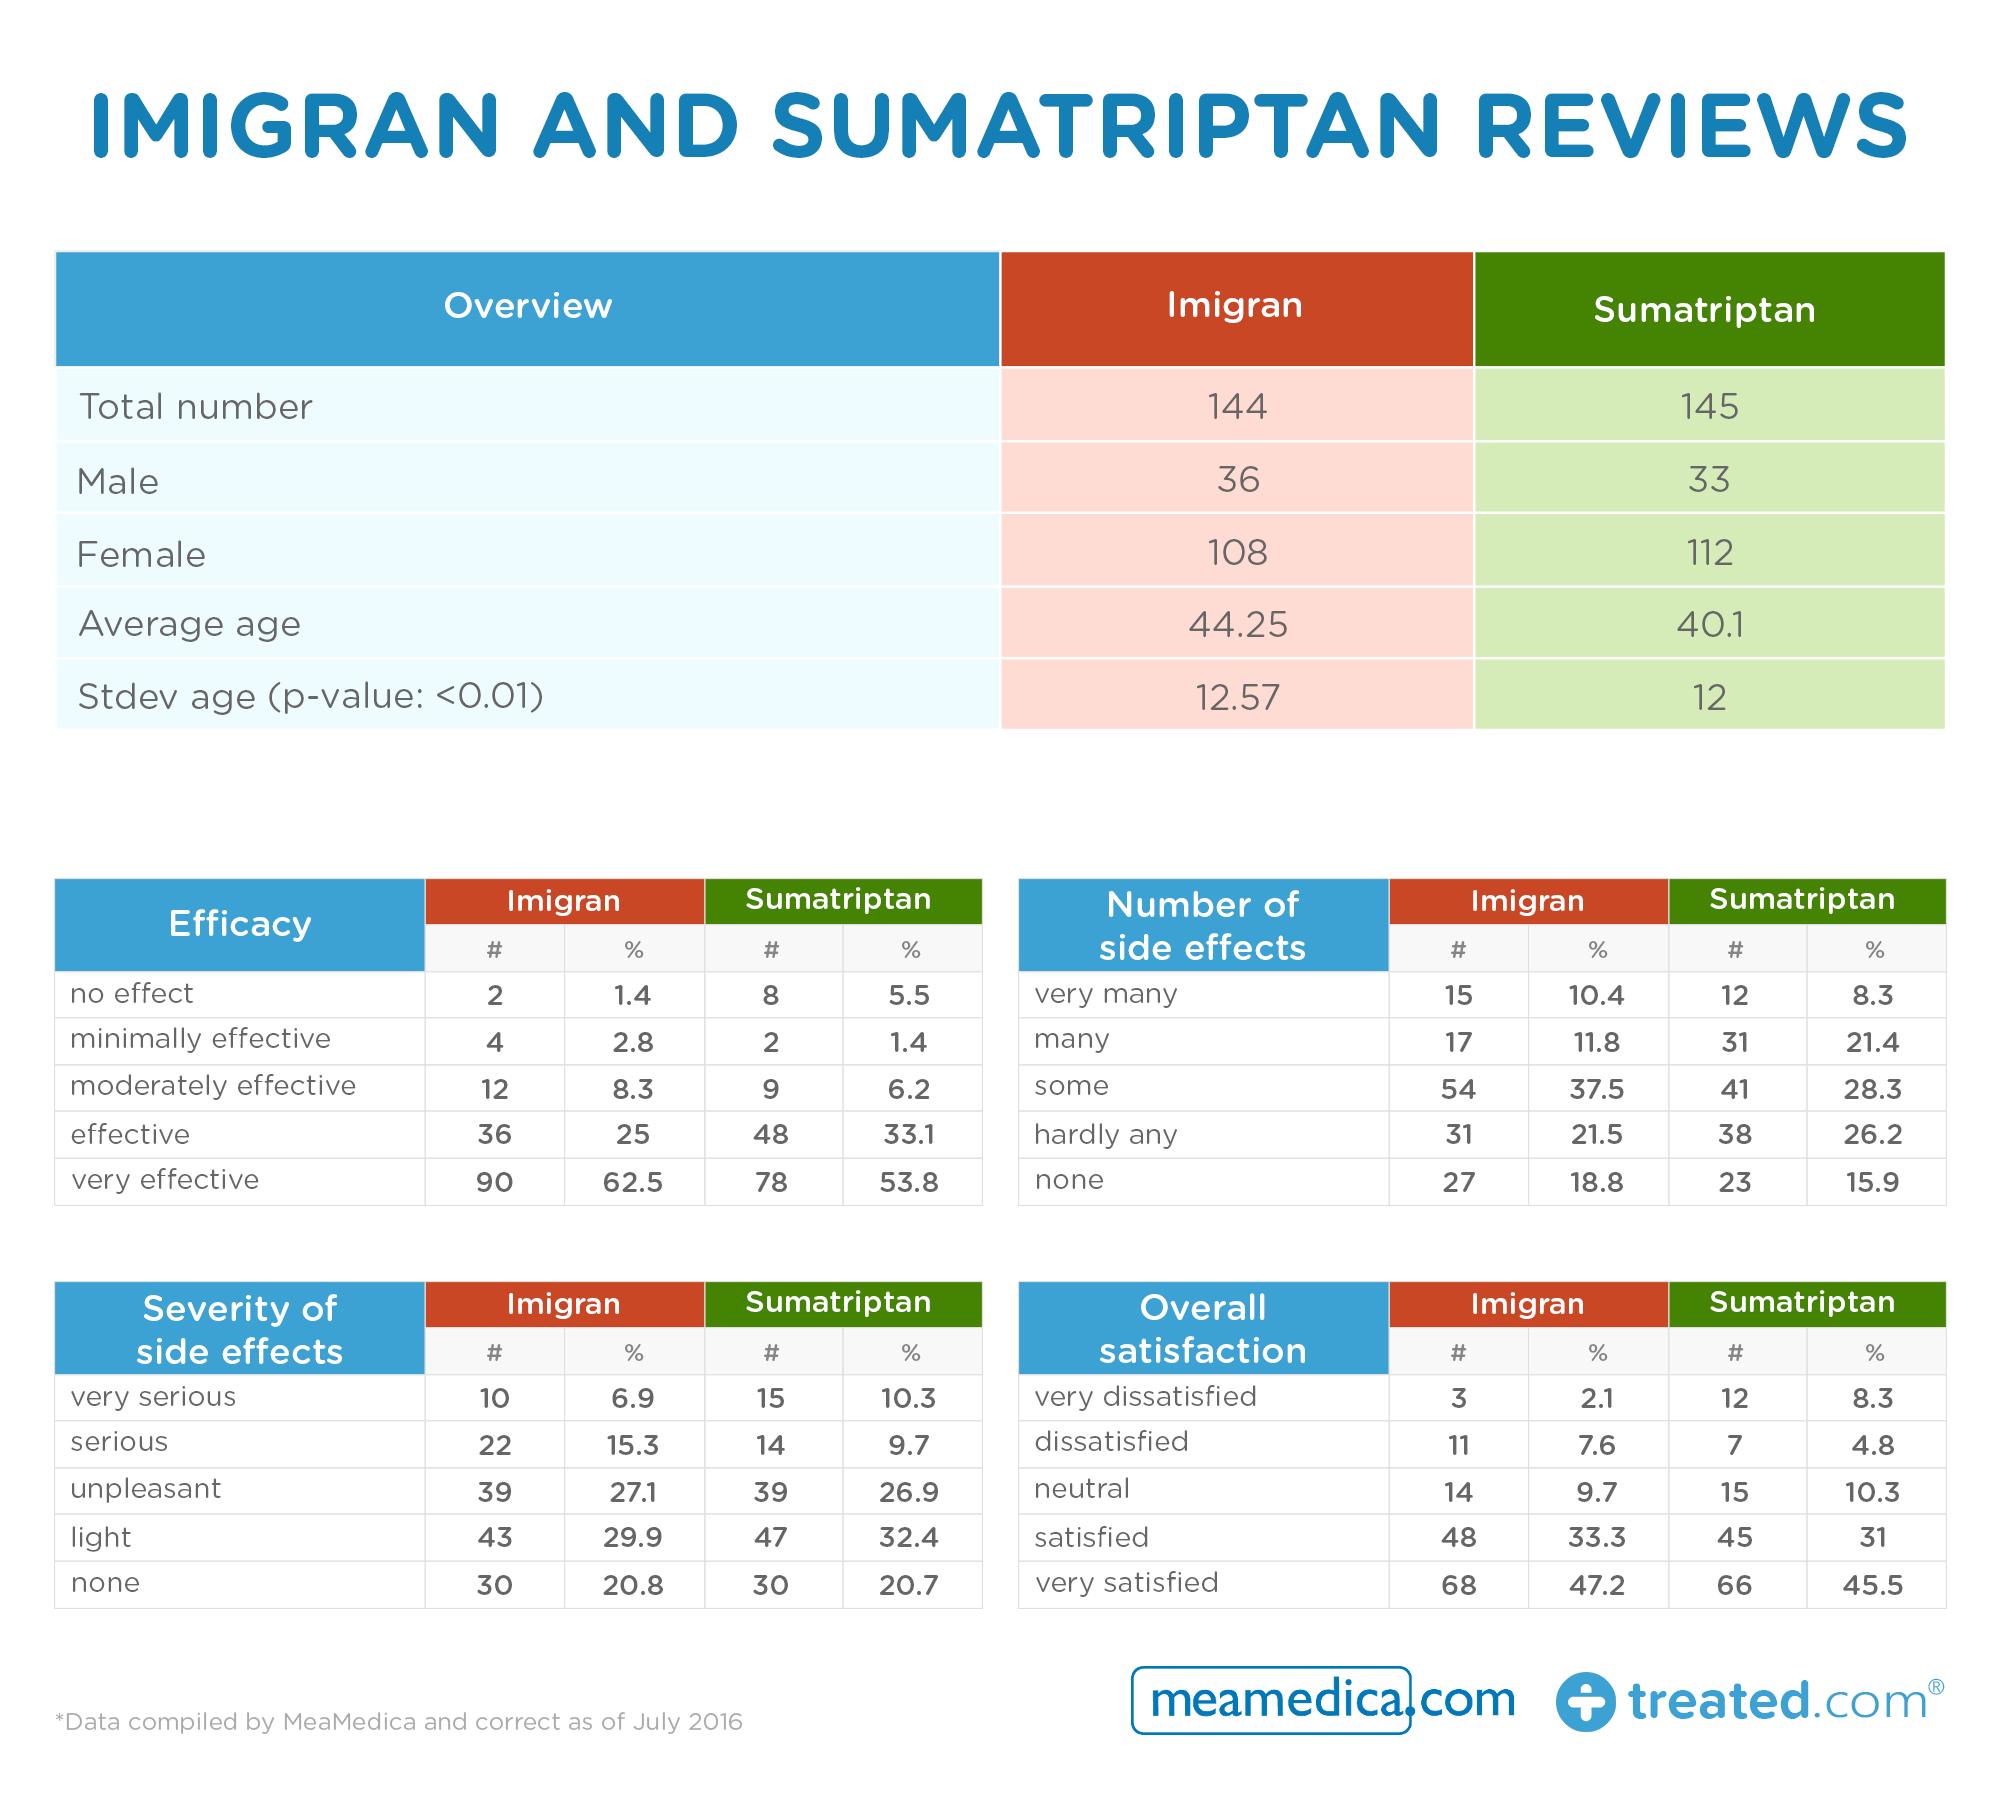 Imigran and Sumatriptan reviews table